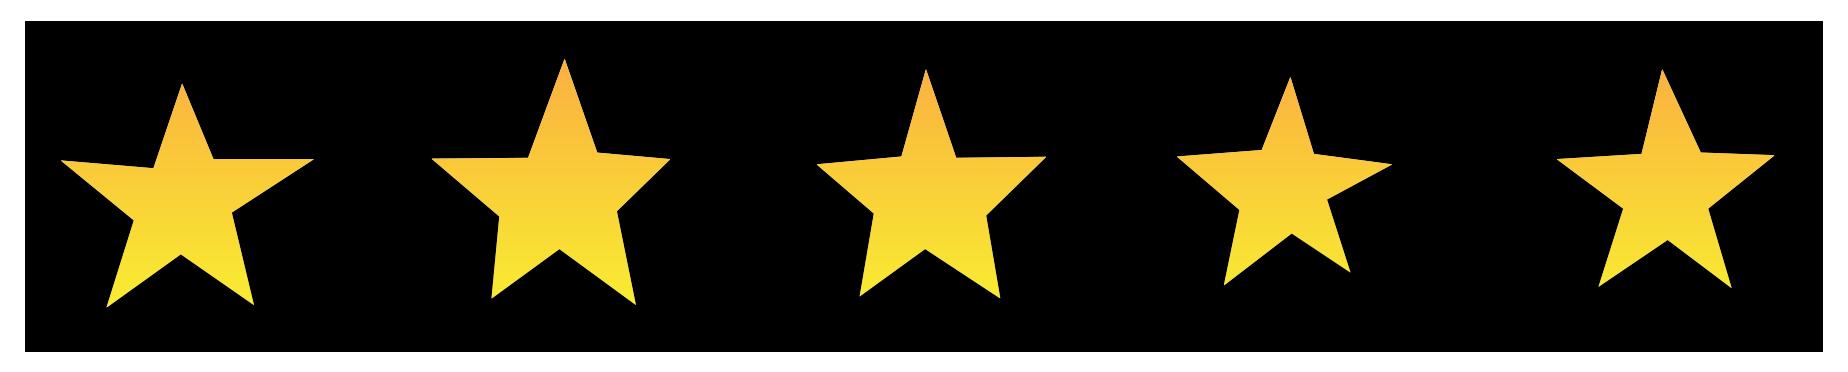 dogandthimble-5-stars.png